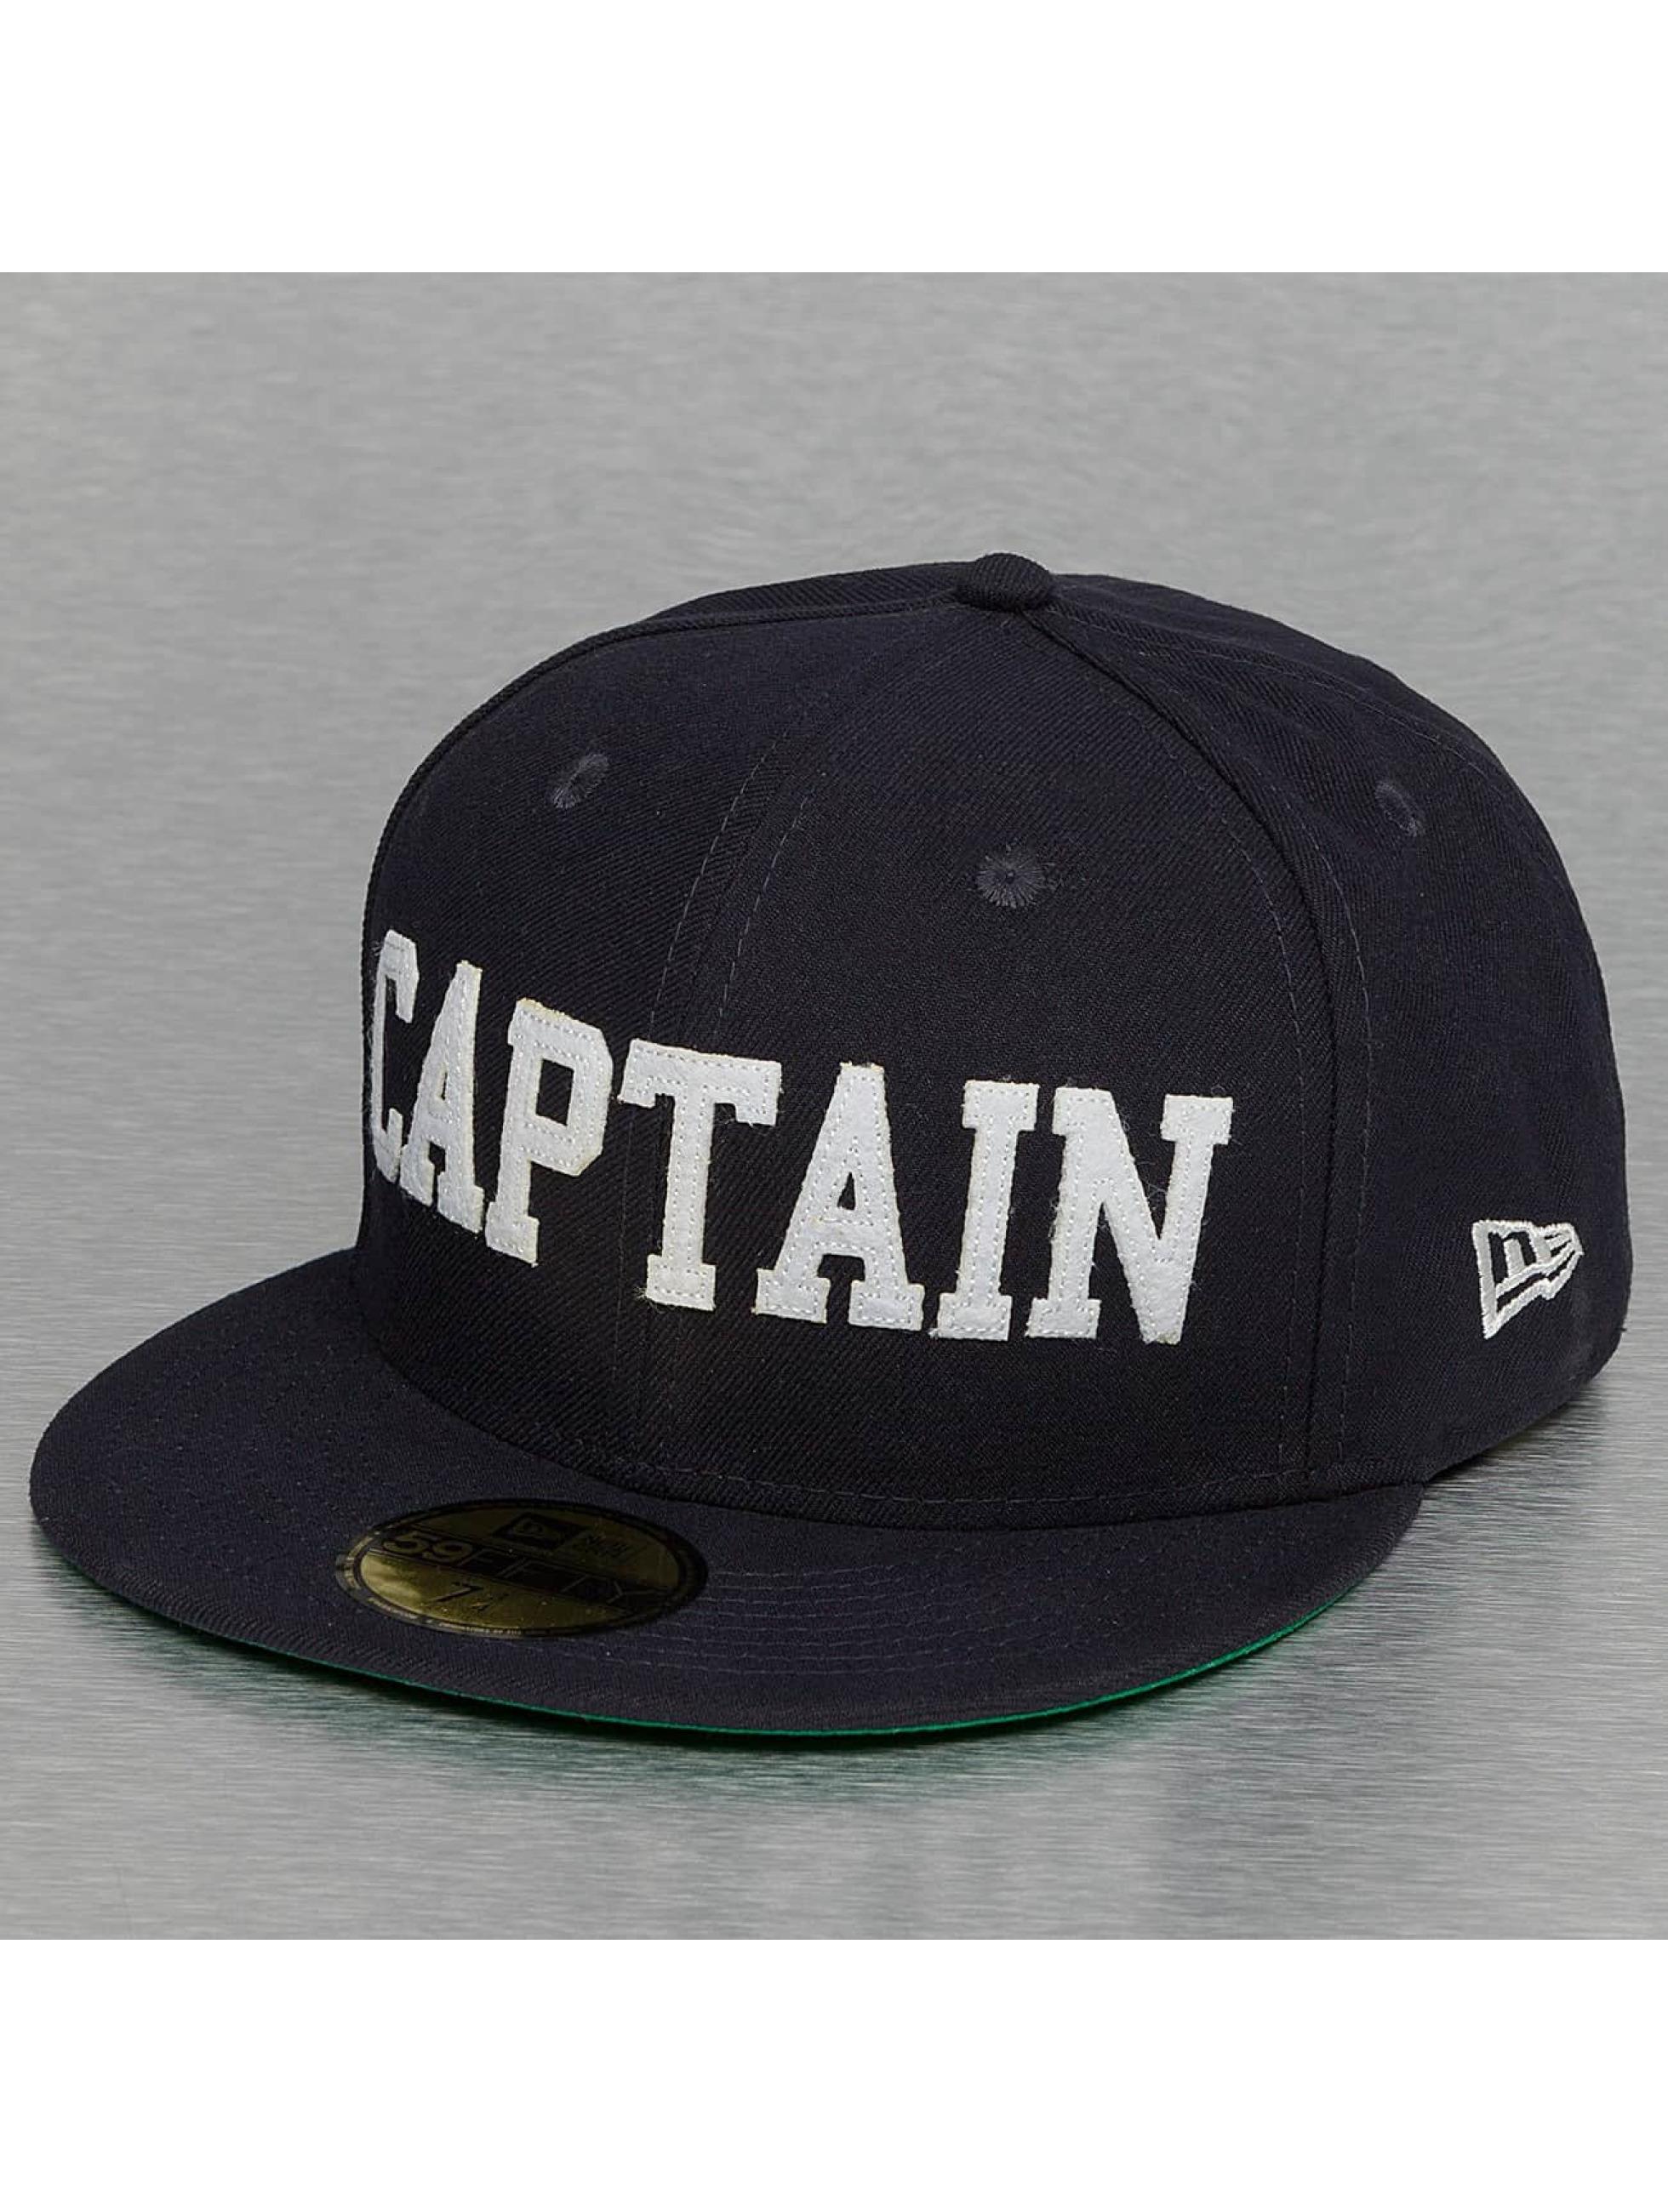 New Era Fitted Cap AKA 59Fifty Captain blau